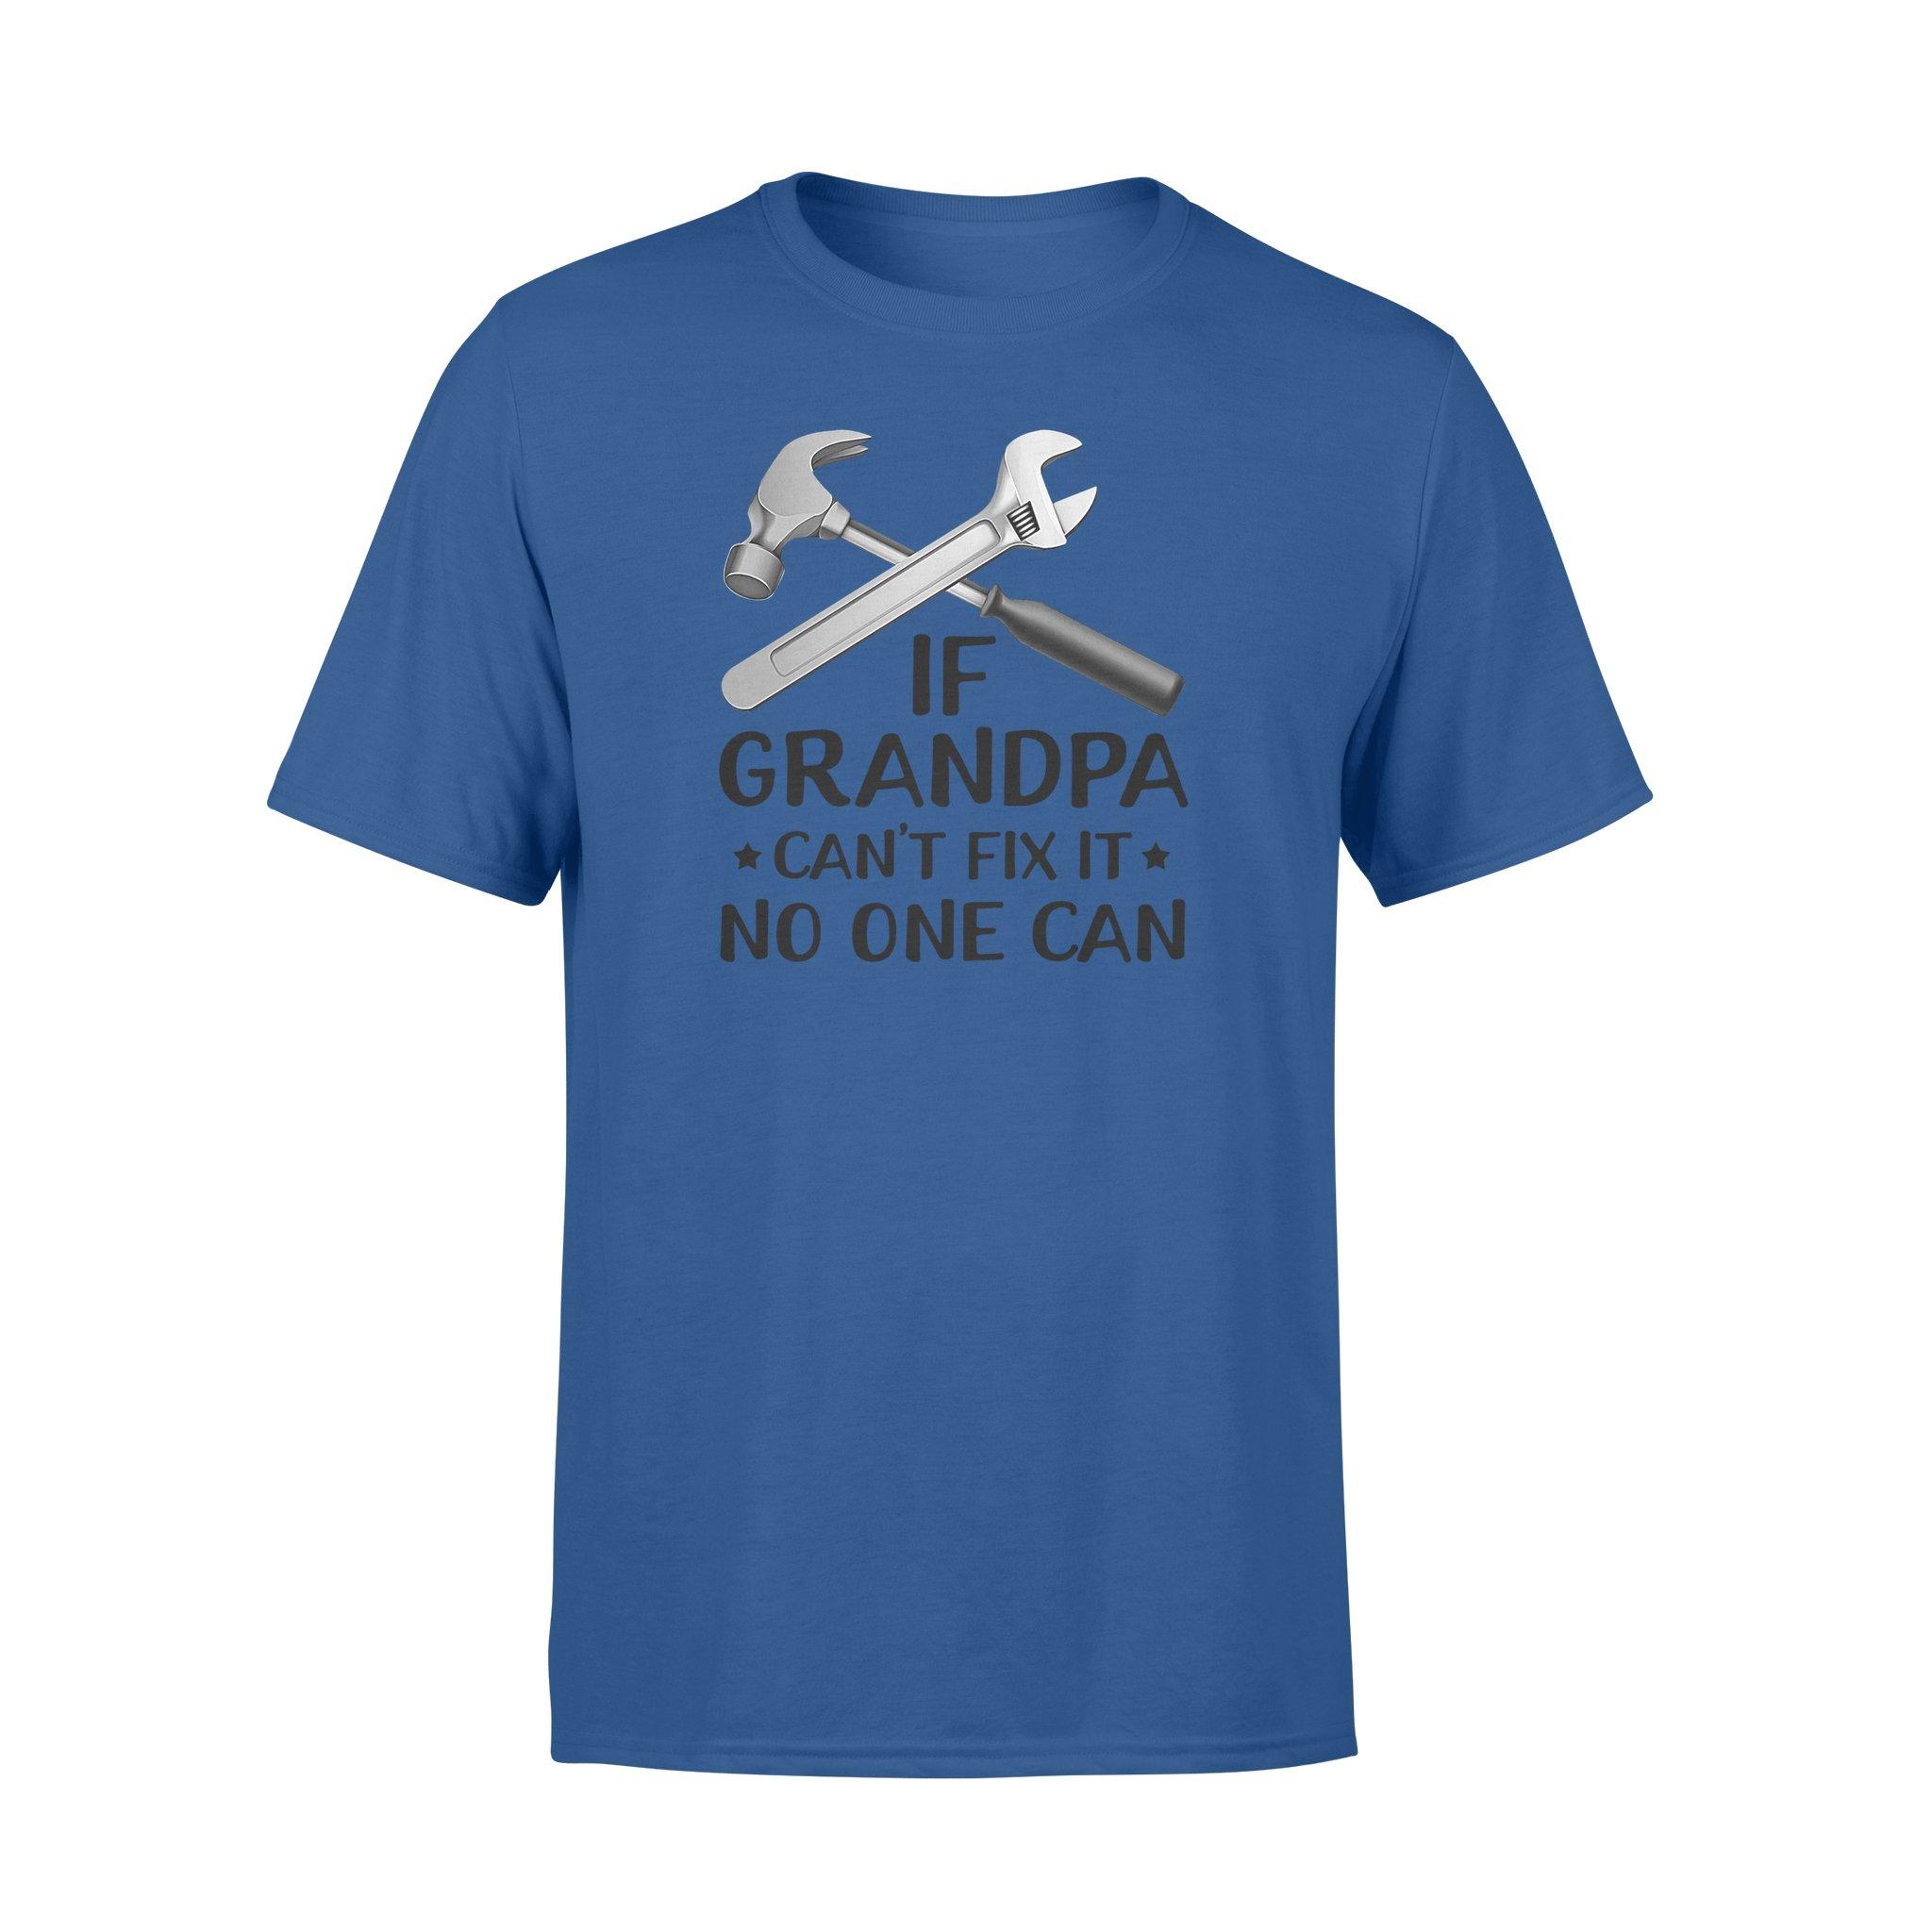 fix it 2 T shirt - Gifts for grandpa